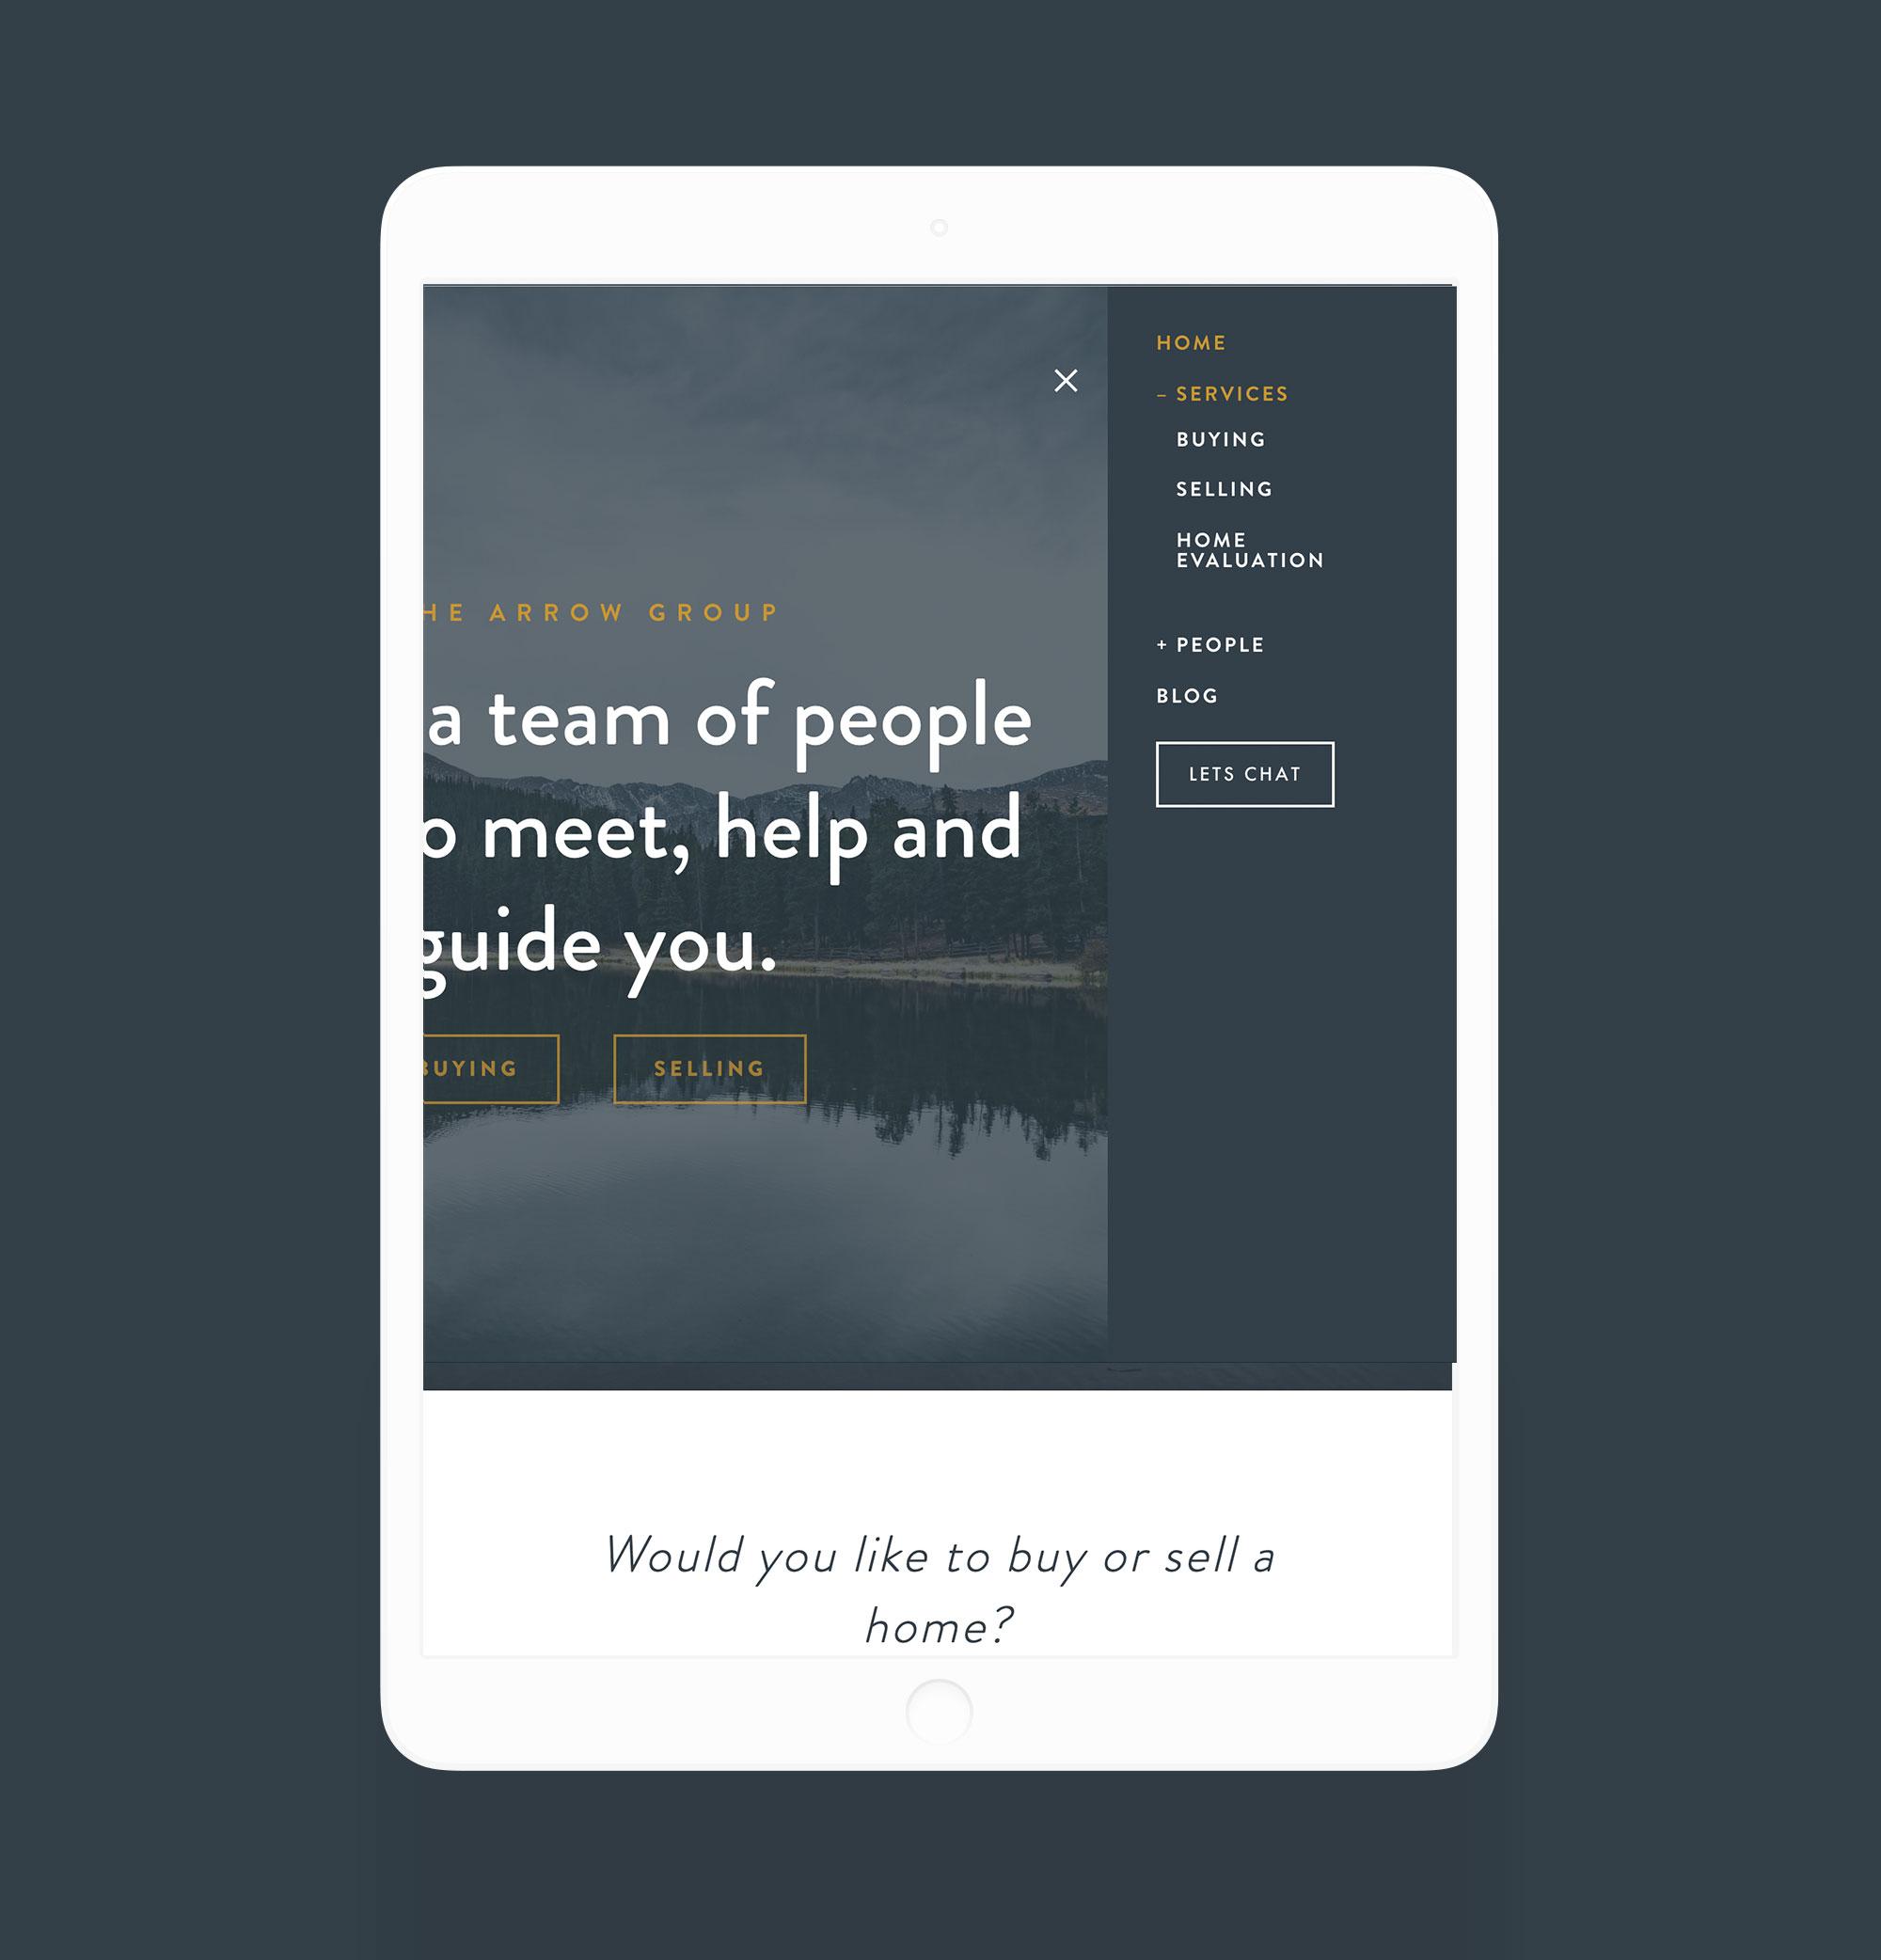 arrow-group-web-iPad-service.jpg